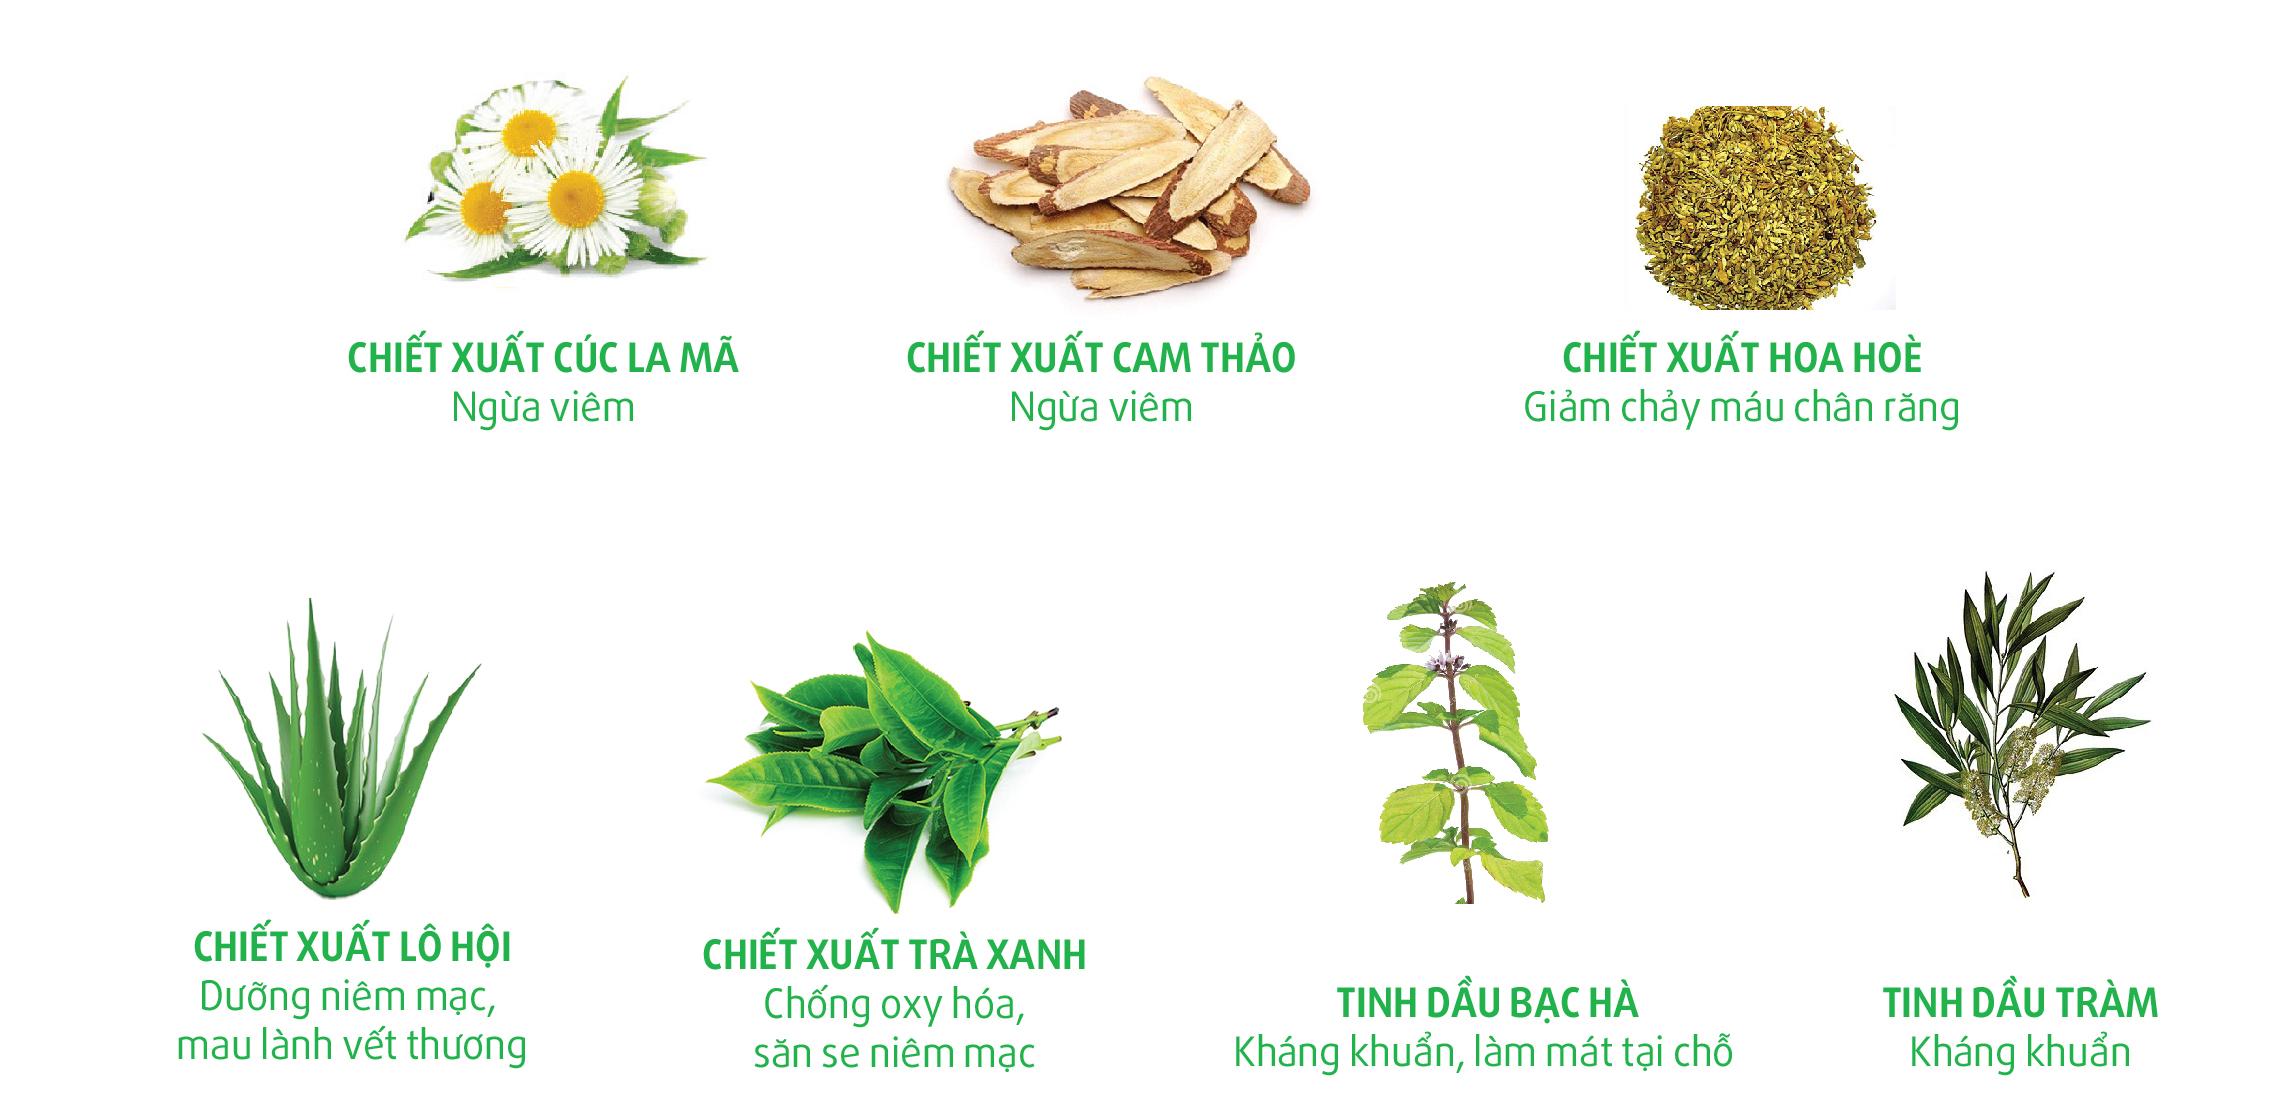 Thanh-phan-nuoc-suc-mieng-ngoc-chau